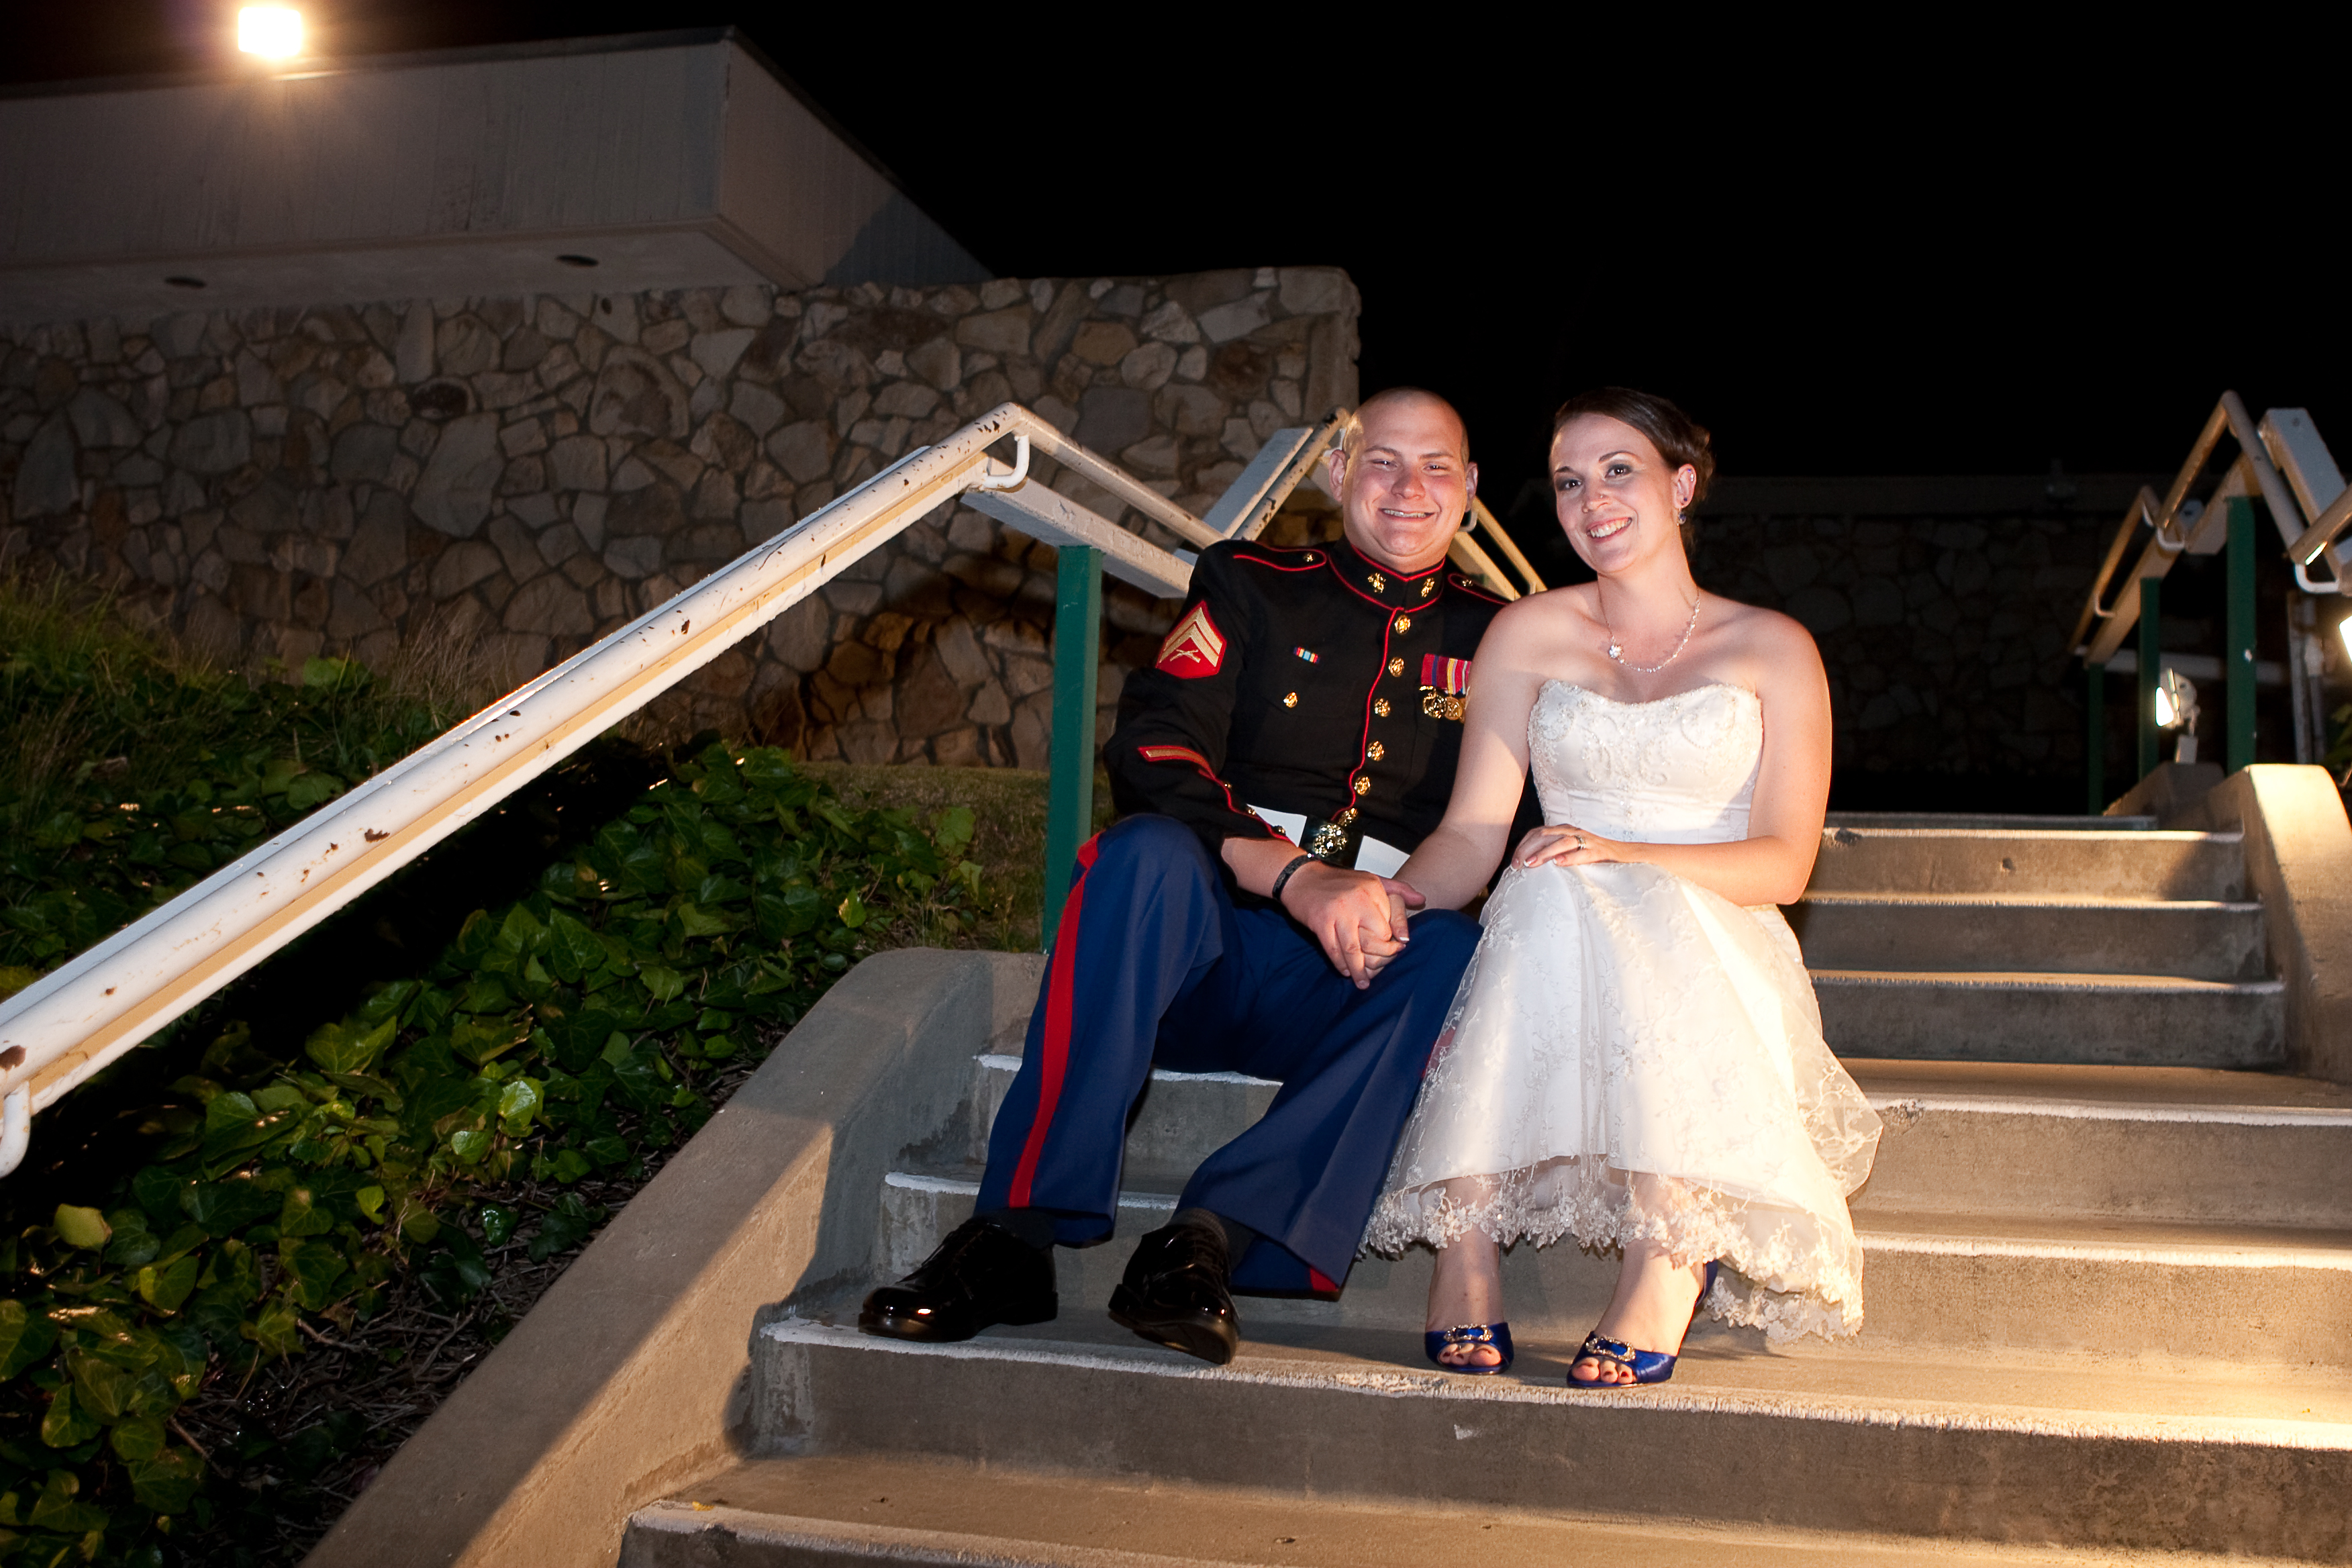 Photography, Military, Night, Maggie, Marine, Shirley, Hollis, Corps, Cari, Soterro